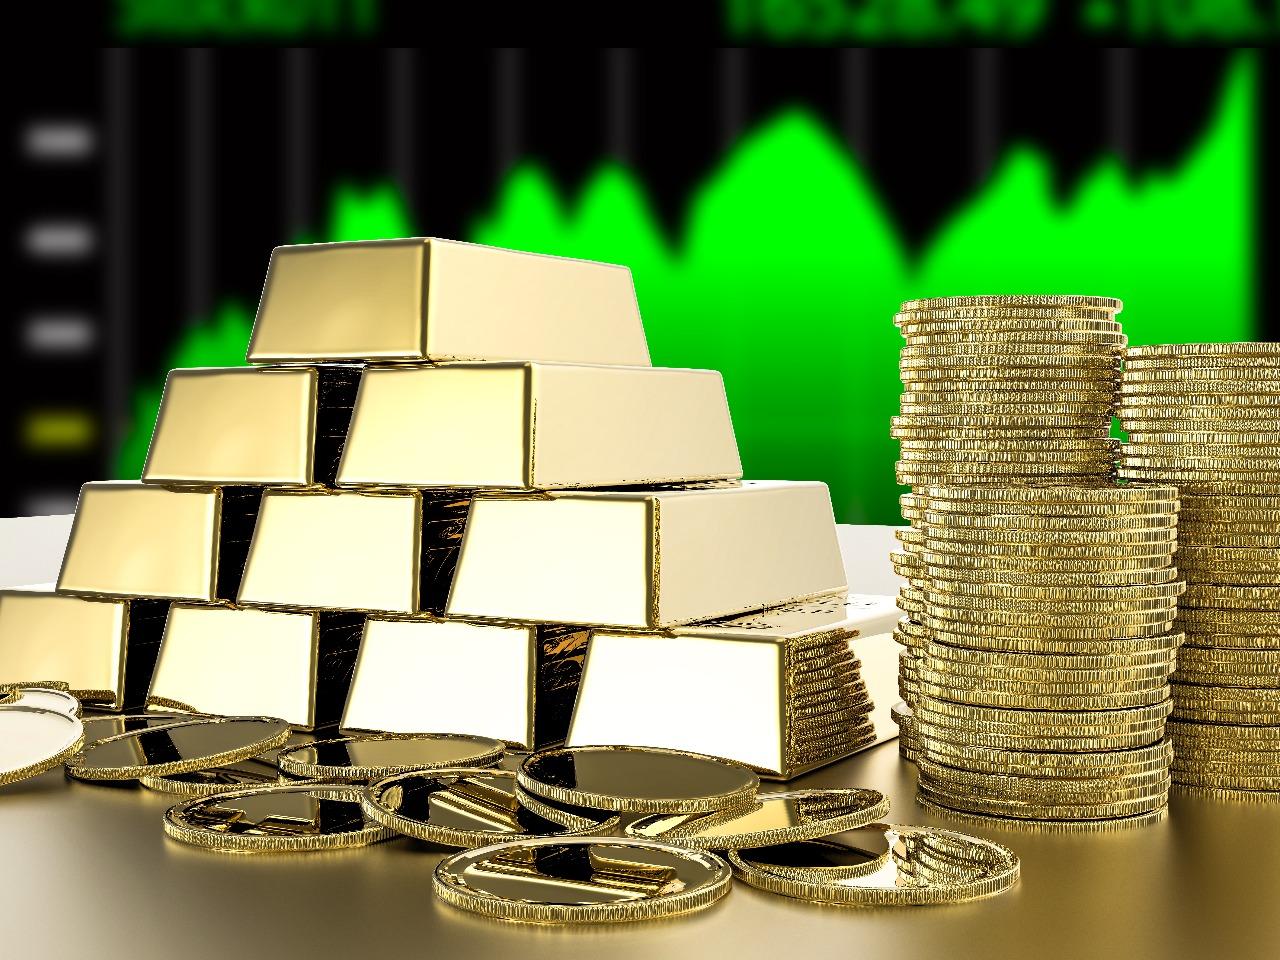 https: img.okezone.com content 2021 05 12 278 2409379 imbal-hasil-obligasi-as-naik-harga-emas-turun-usd1-5-ounce-rbfRQRoCqg.jpg